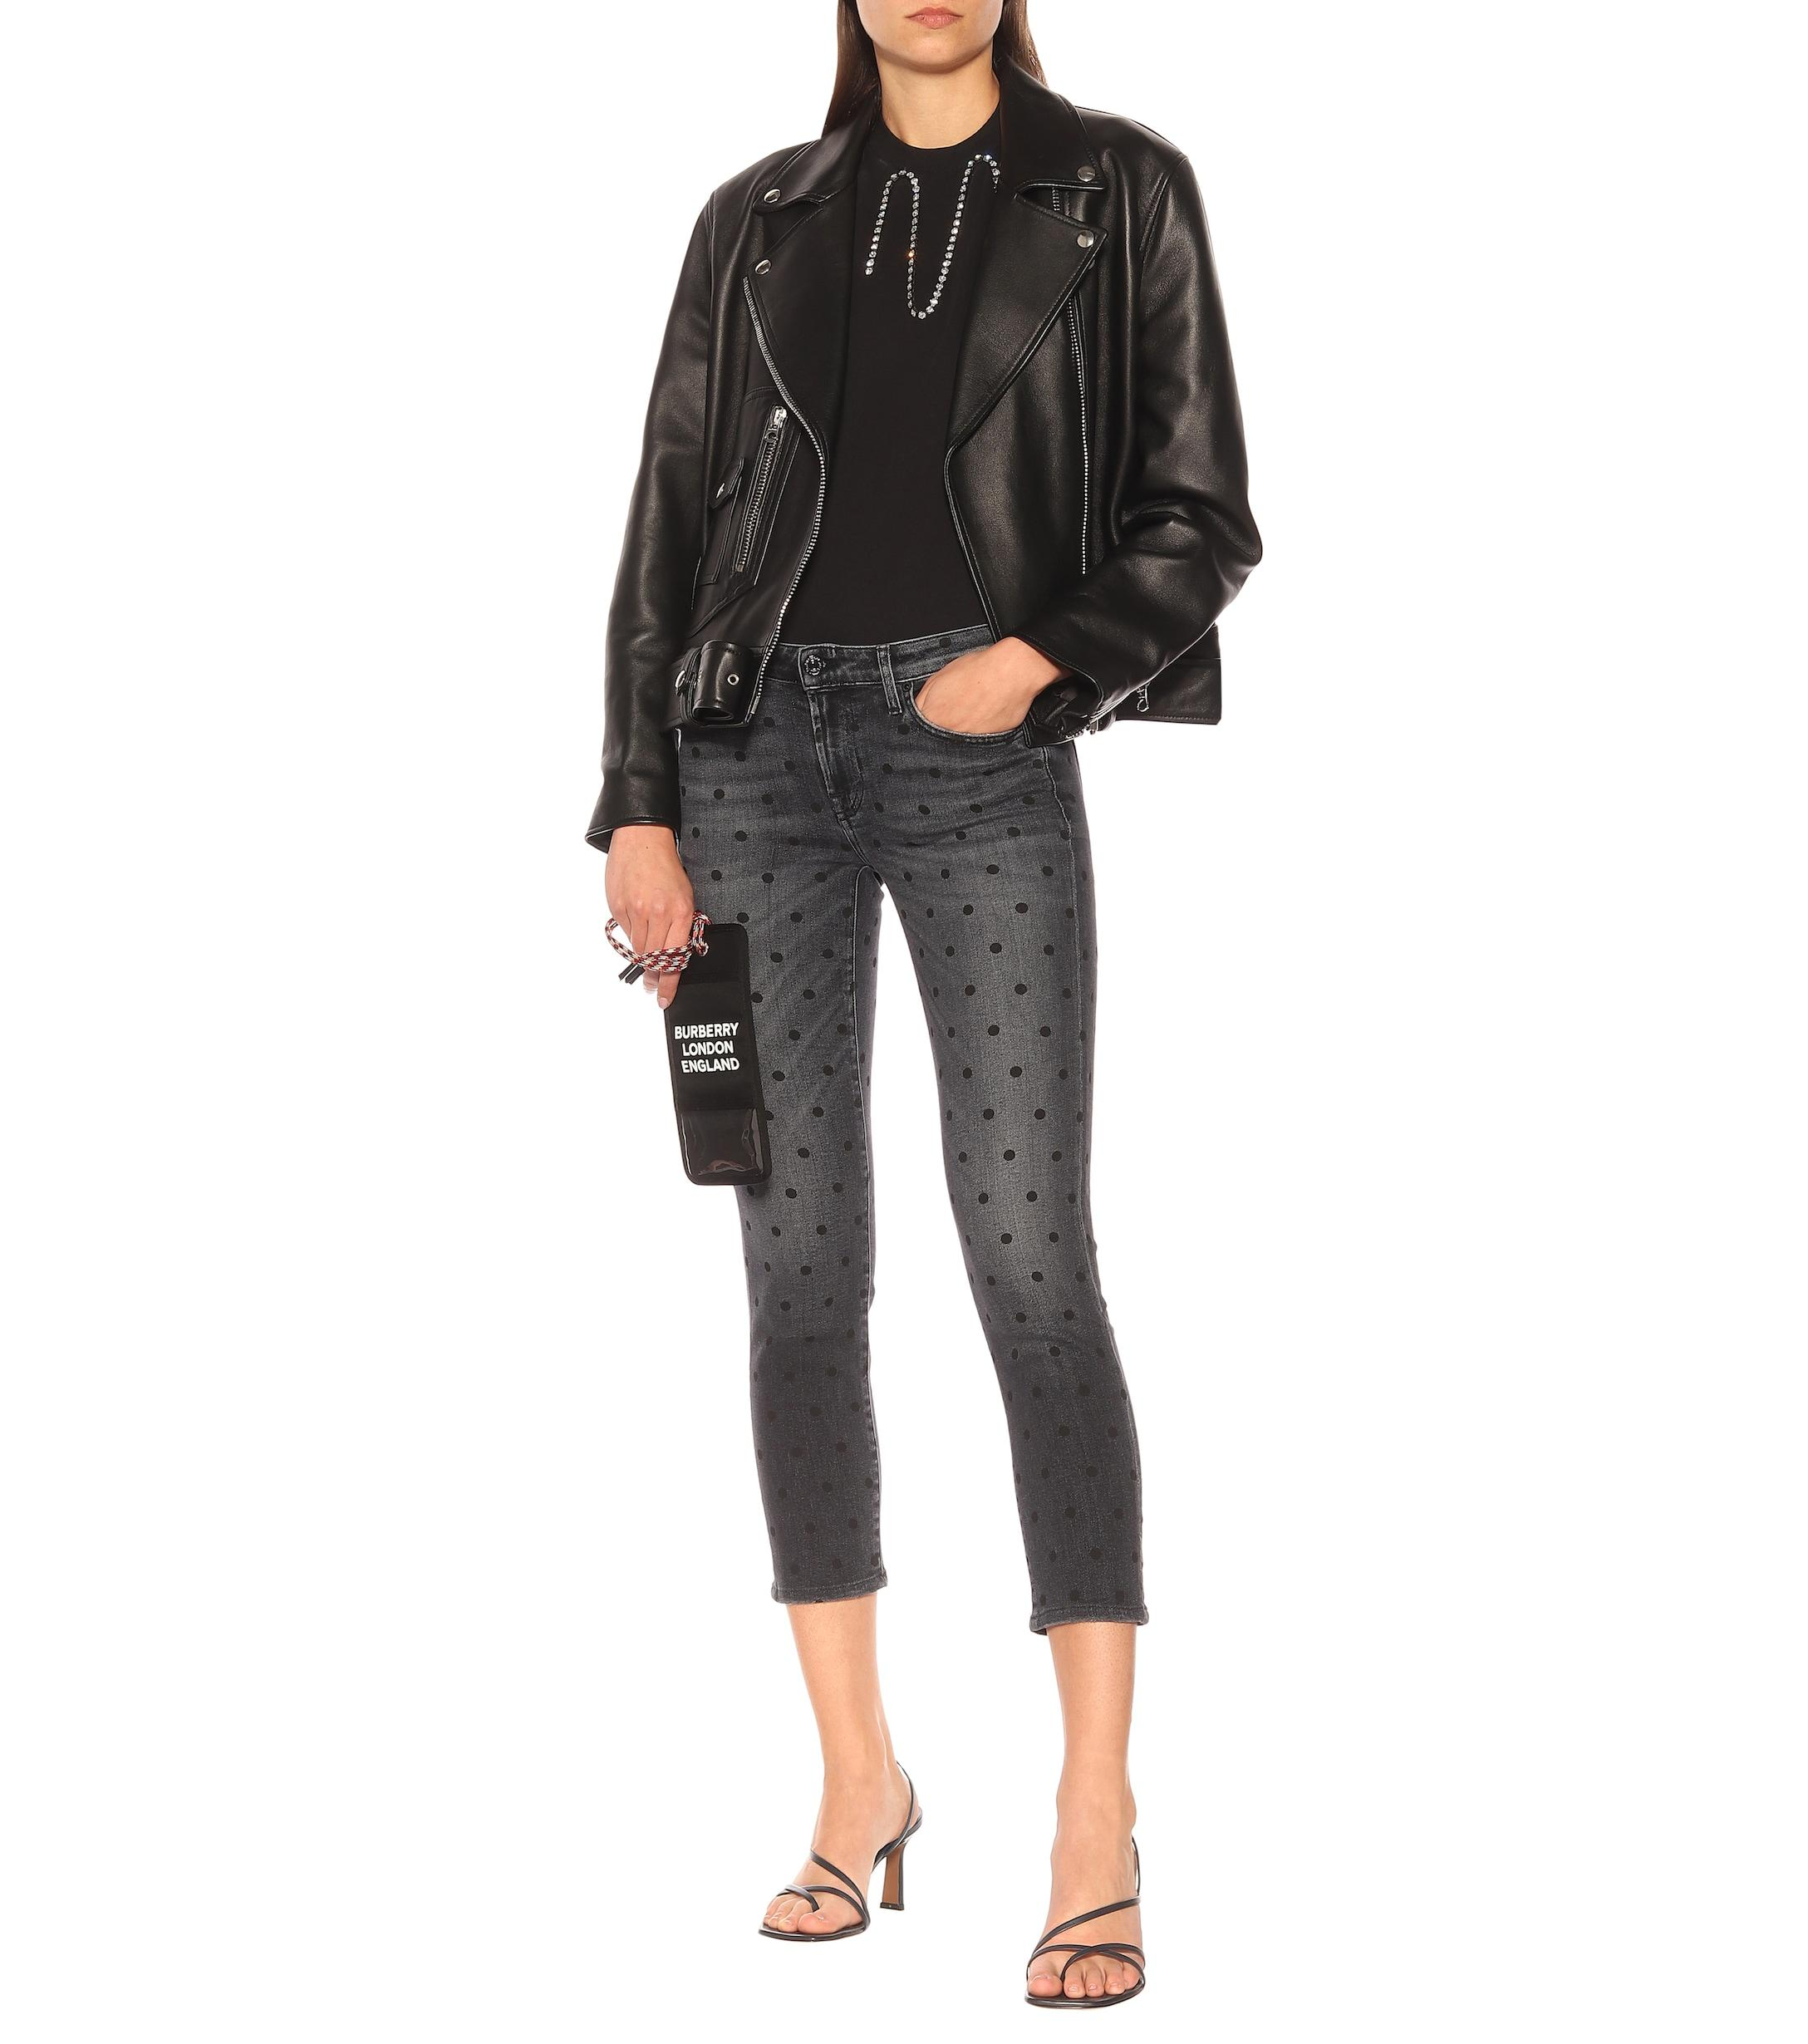 Jean skinny Pyper Crop raccourci à taille mi-haute Jean 7 For All Mankind en coloris Noir